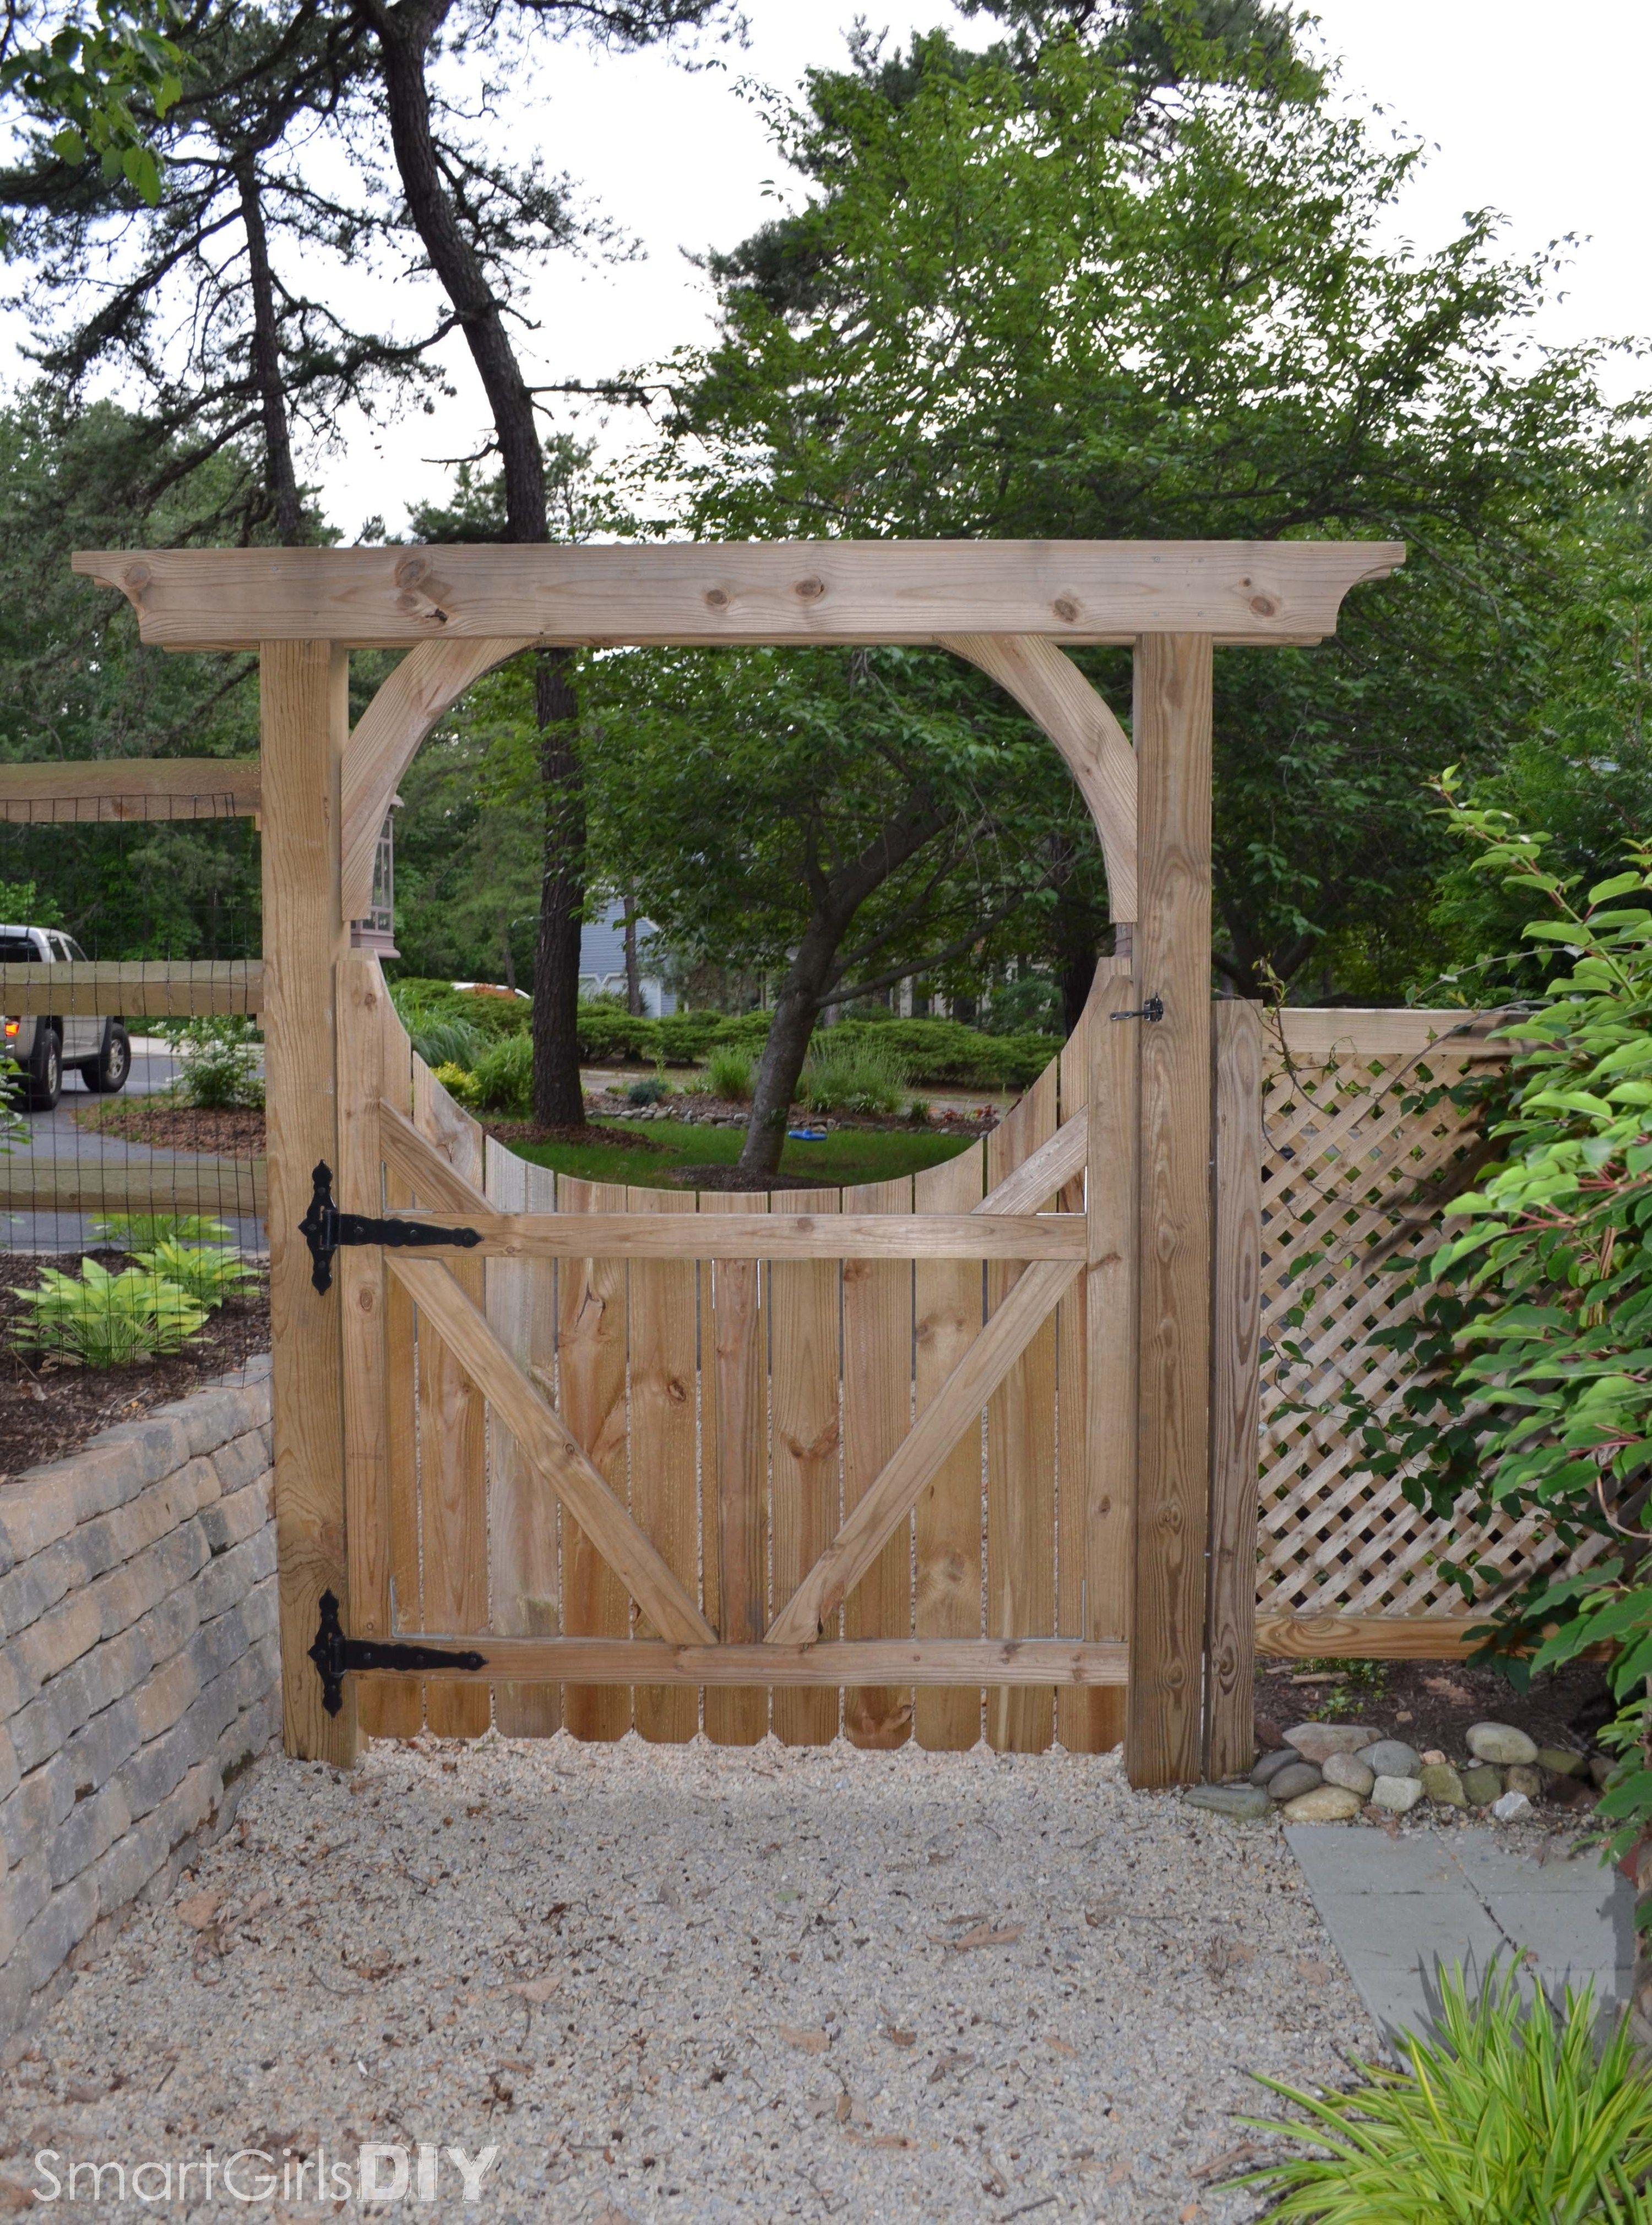 Rear View Of Diy Garden Arbor And Gate Garden Arbor With Gate